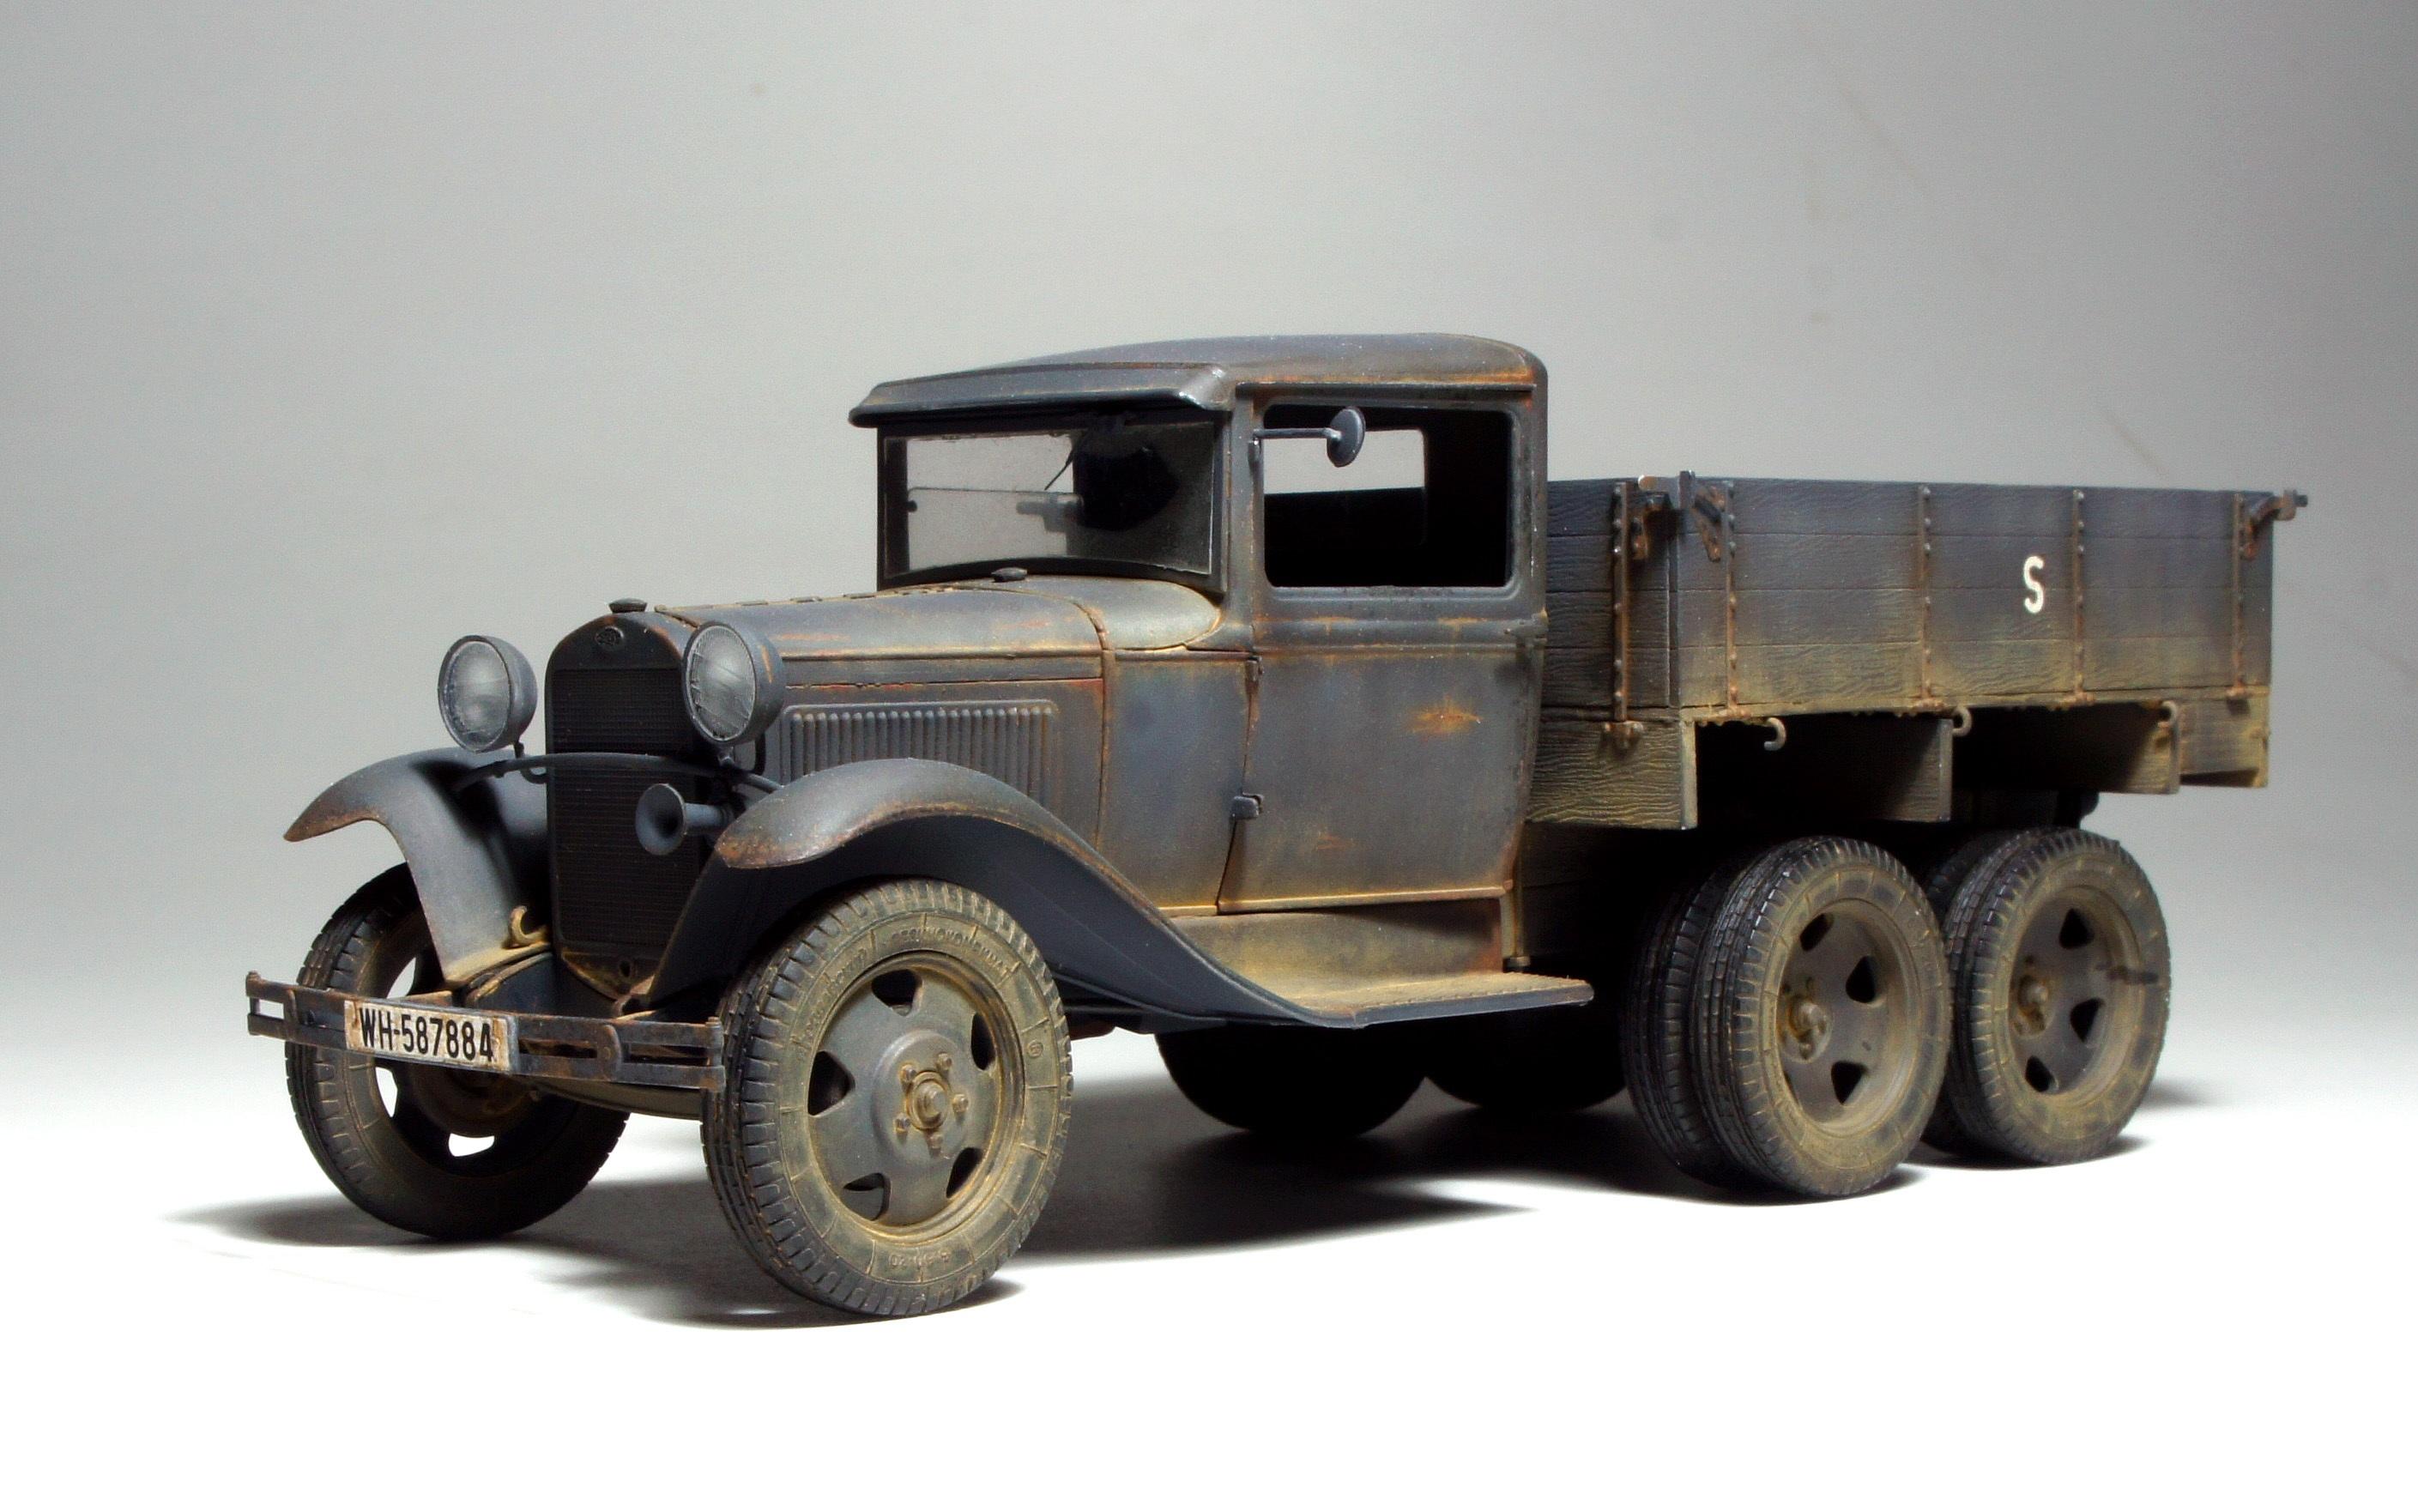 Free Images : retro, truck, vintage car, world war, model car ...